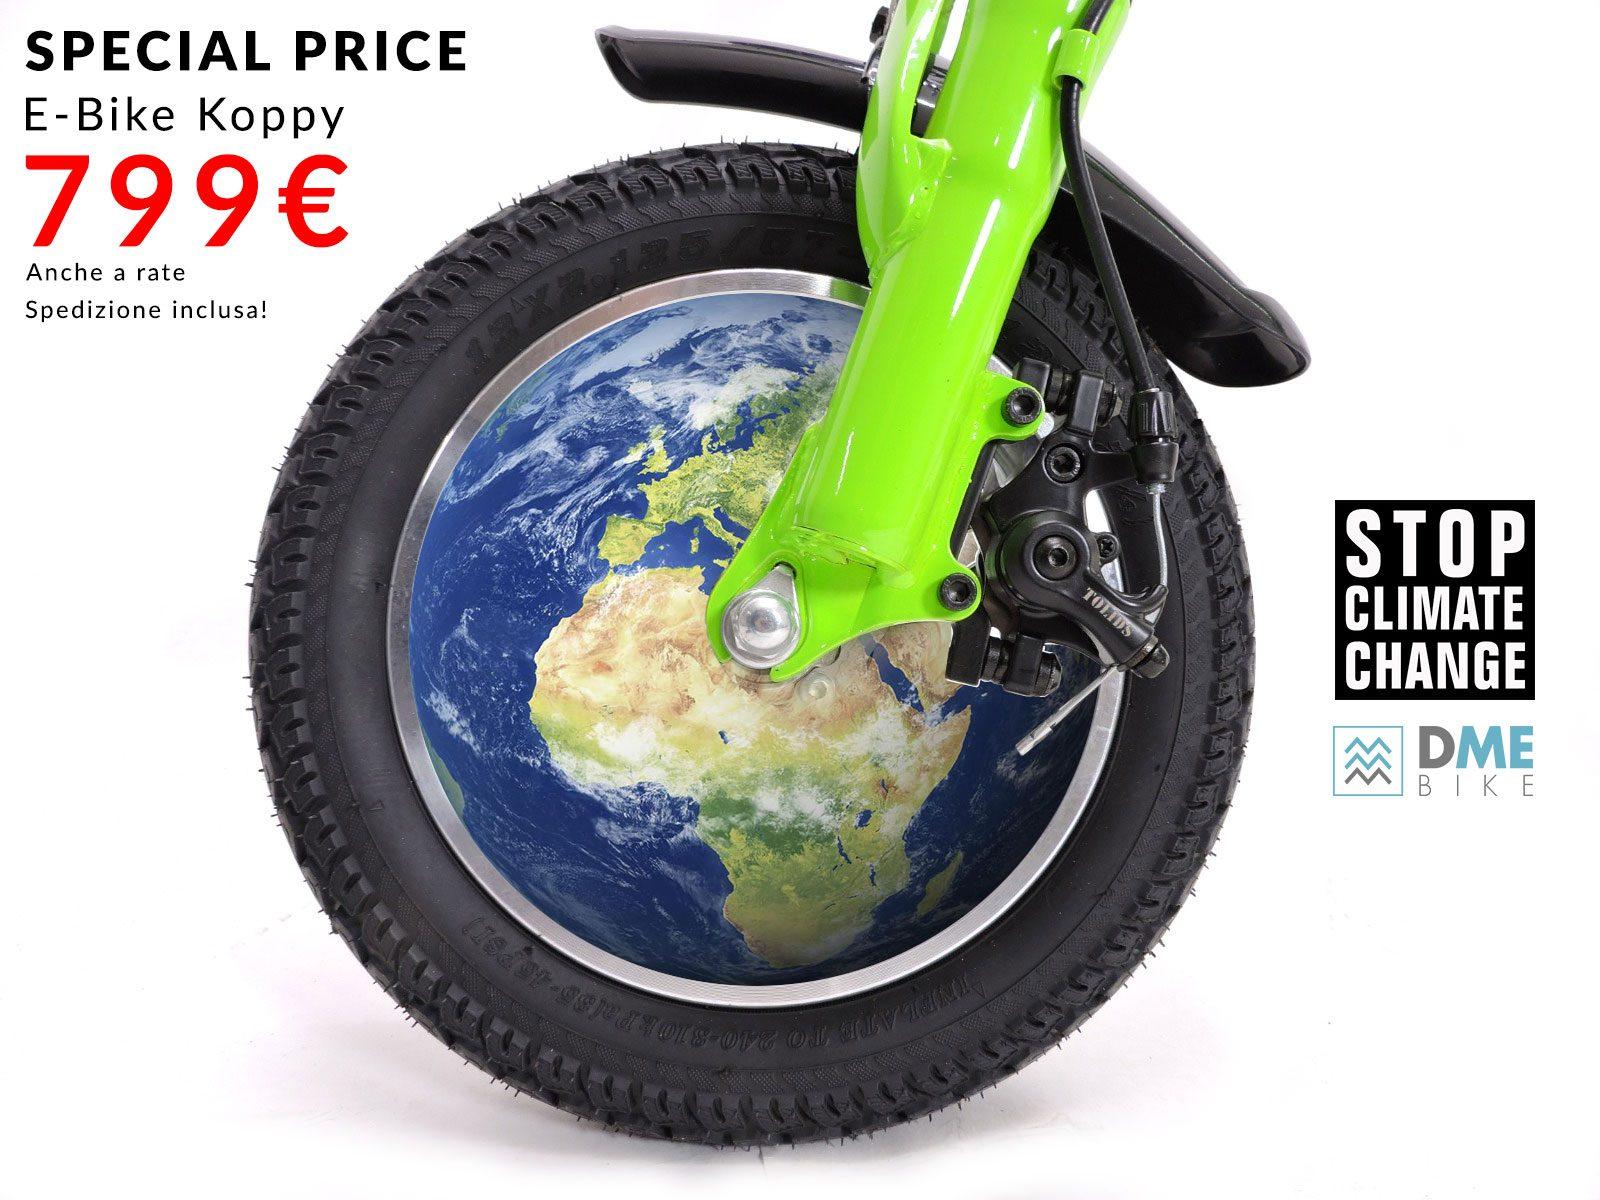 Koppy bici elettrica a metà prezzo